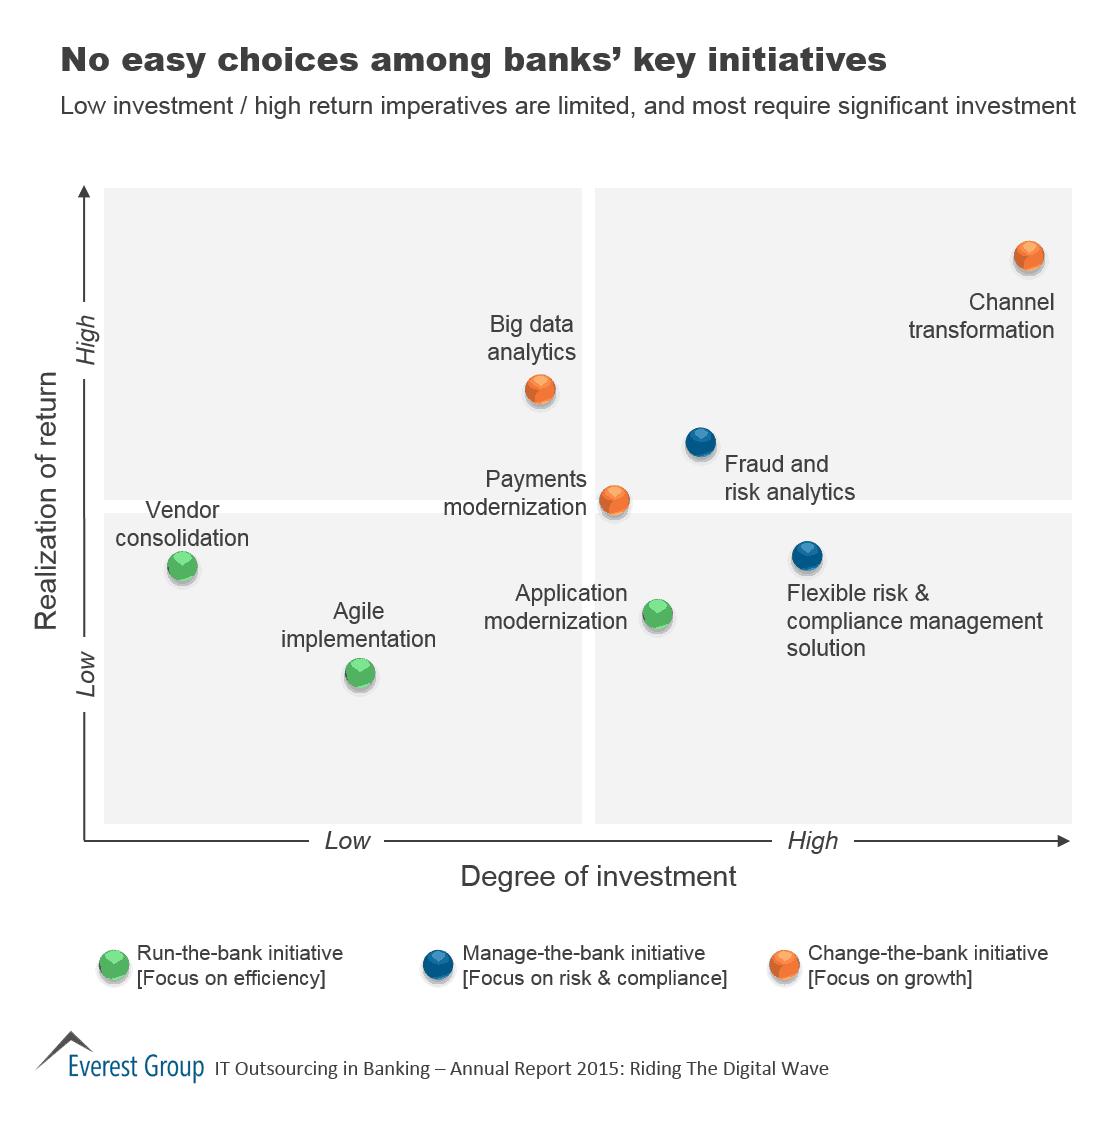 No Easy Choices Among Banks' Key Initiatives | Market